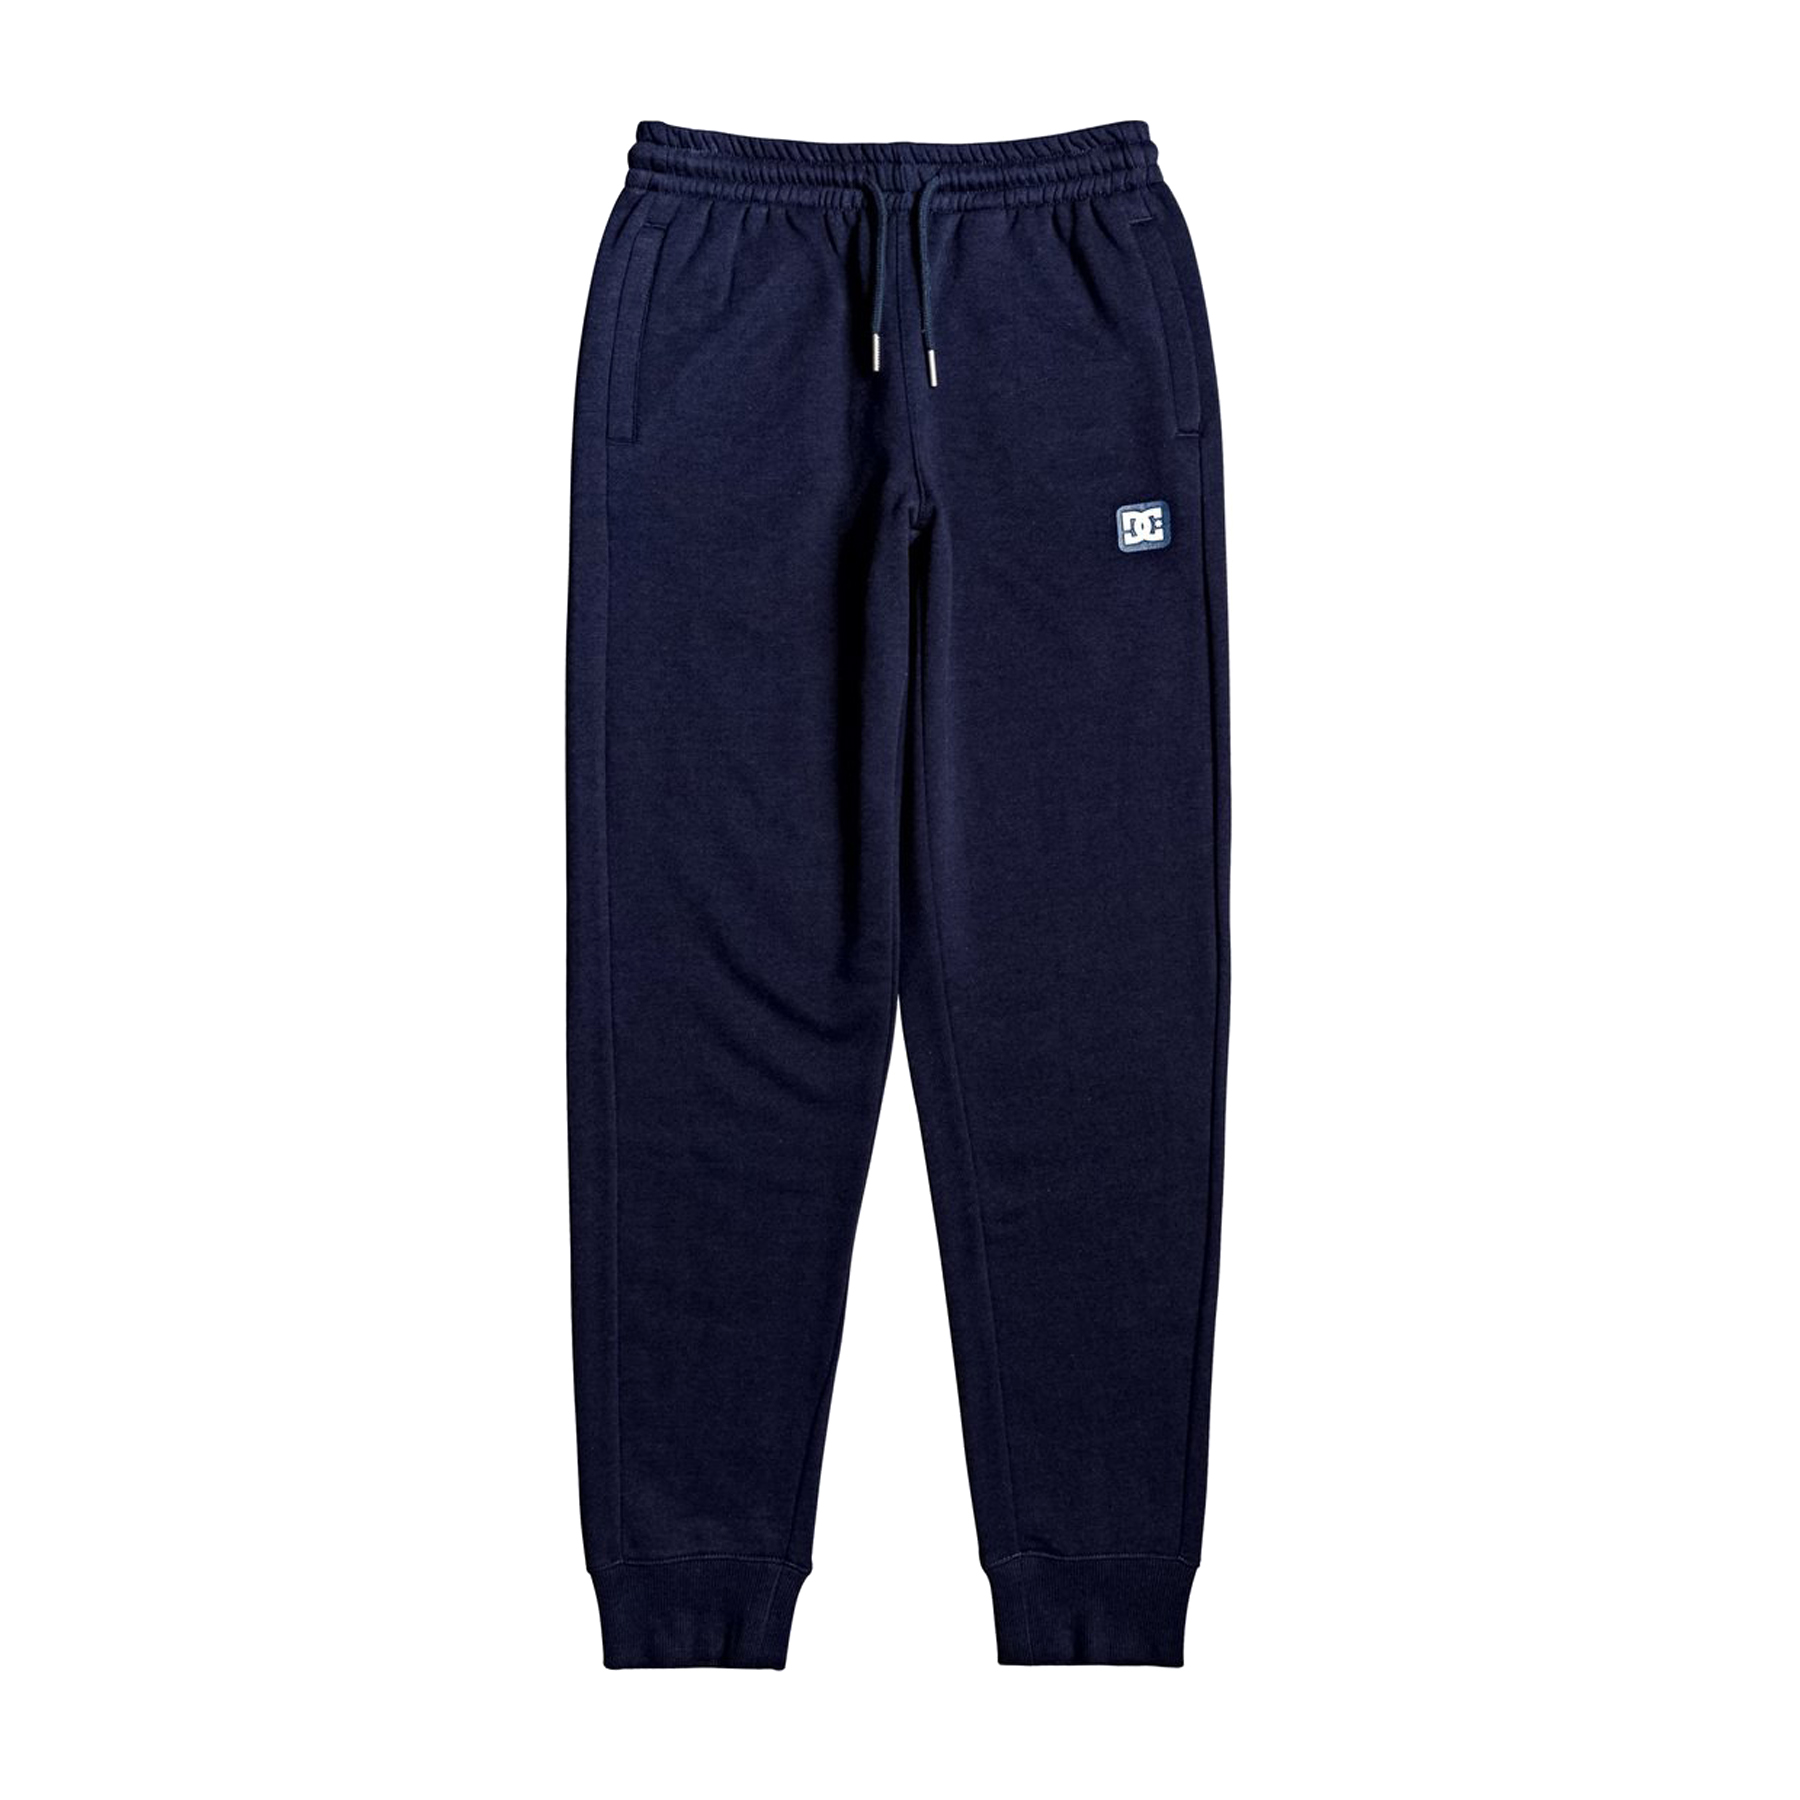 Adidas Originals Jeans Sko tilgjengelig fra Surfdome